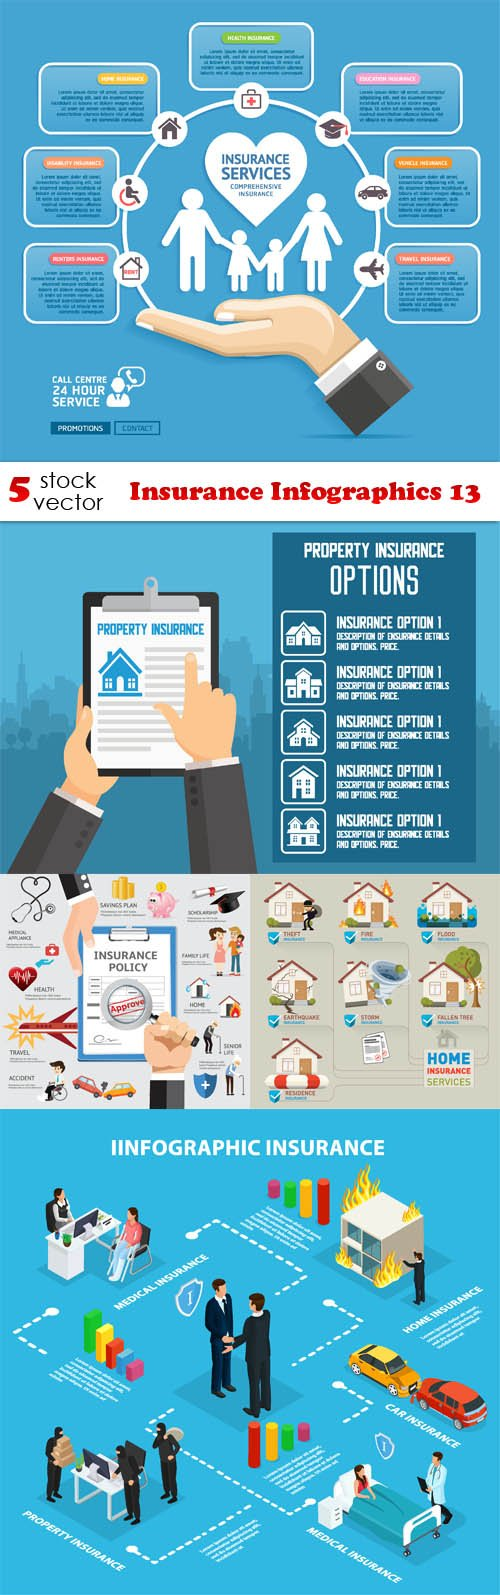 Vectors - Insurance Infographics 13